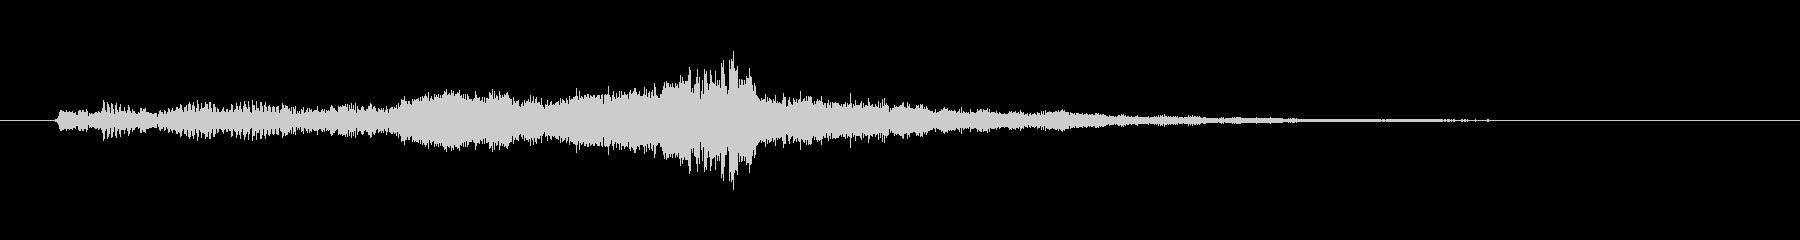 Future, IT, pounding, sound logo, company's unreproduced waveform